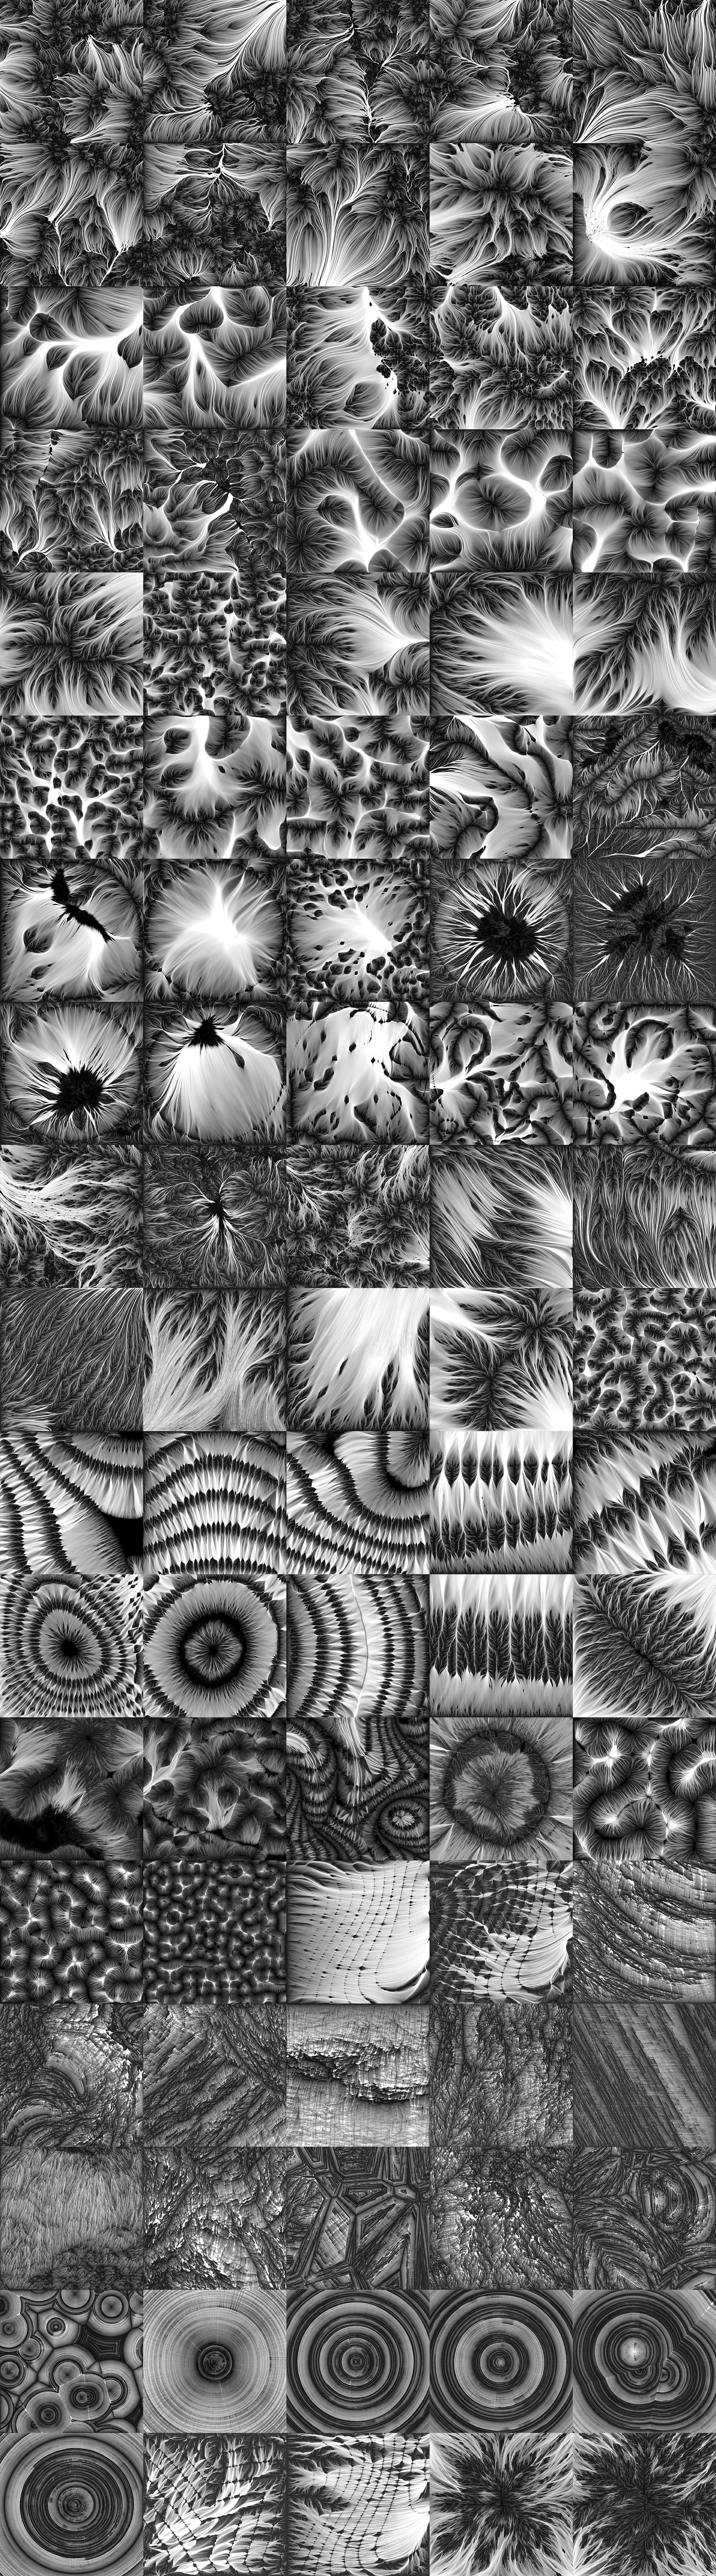 retina pro overall previews.jpg